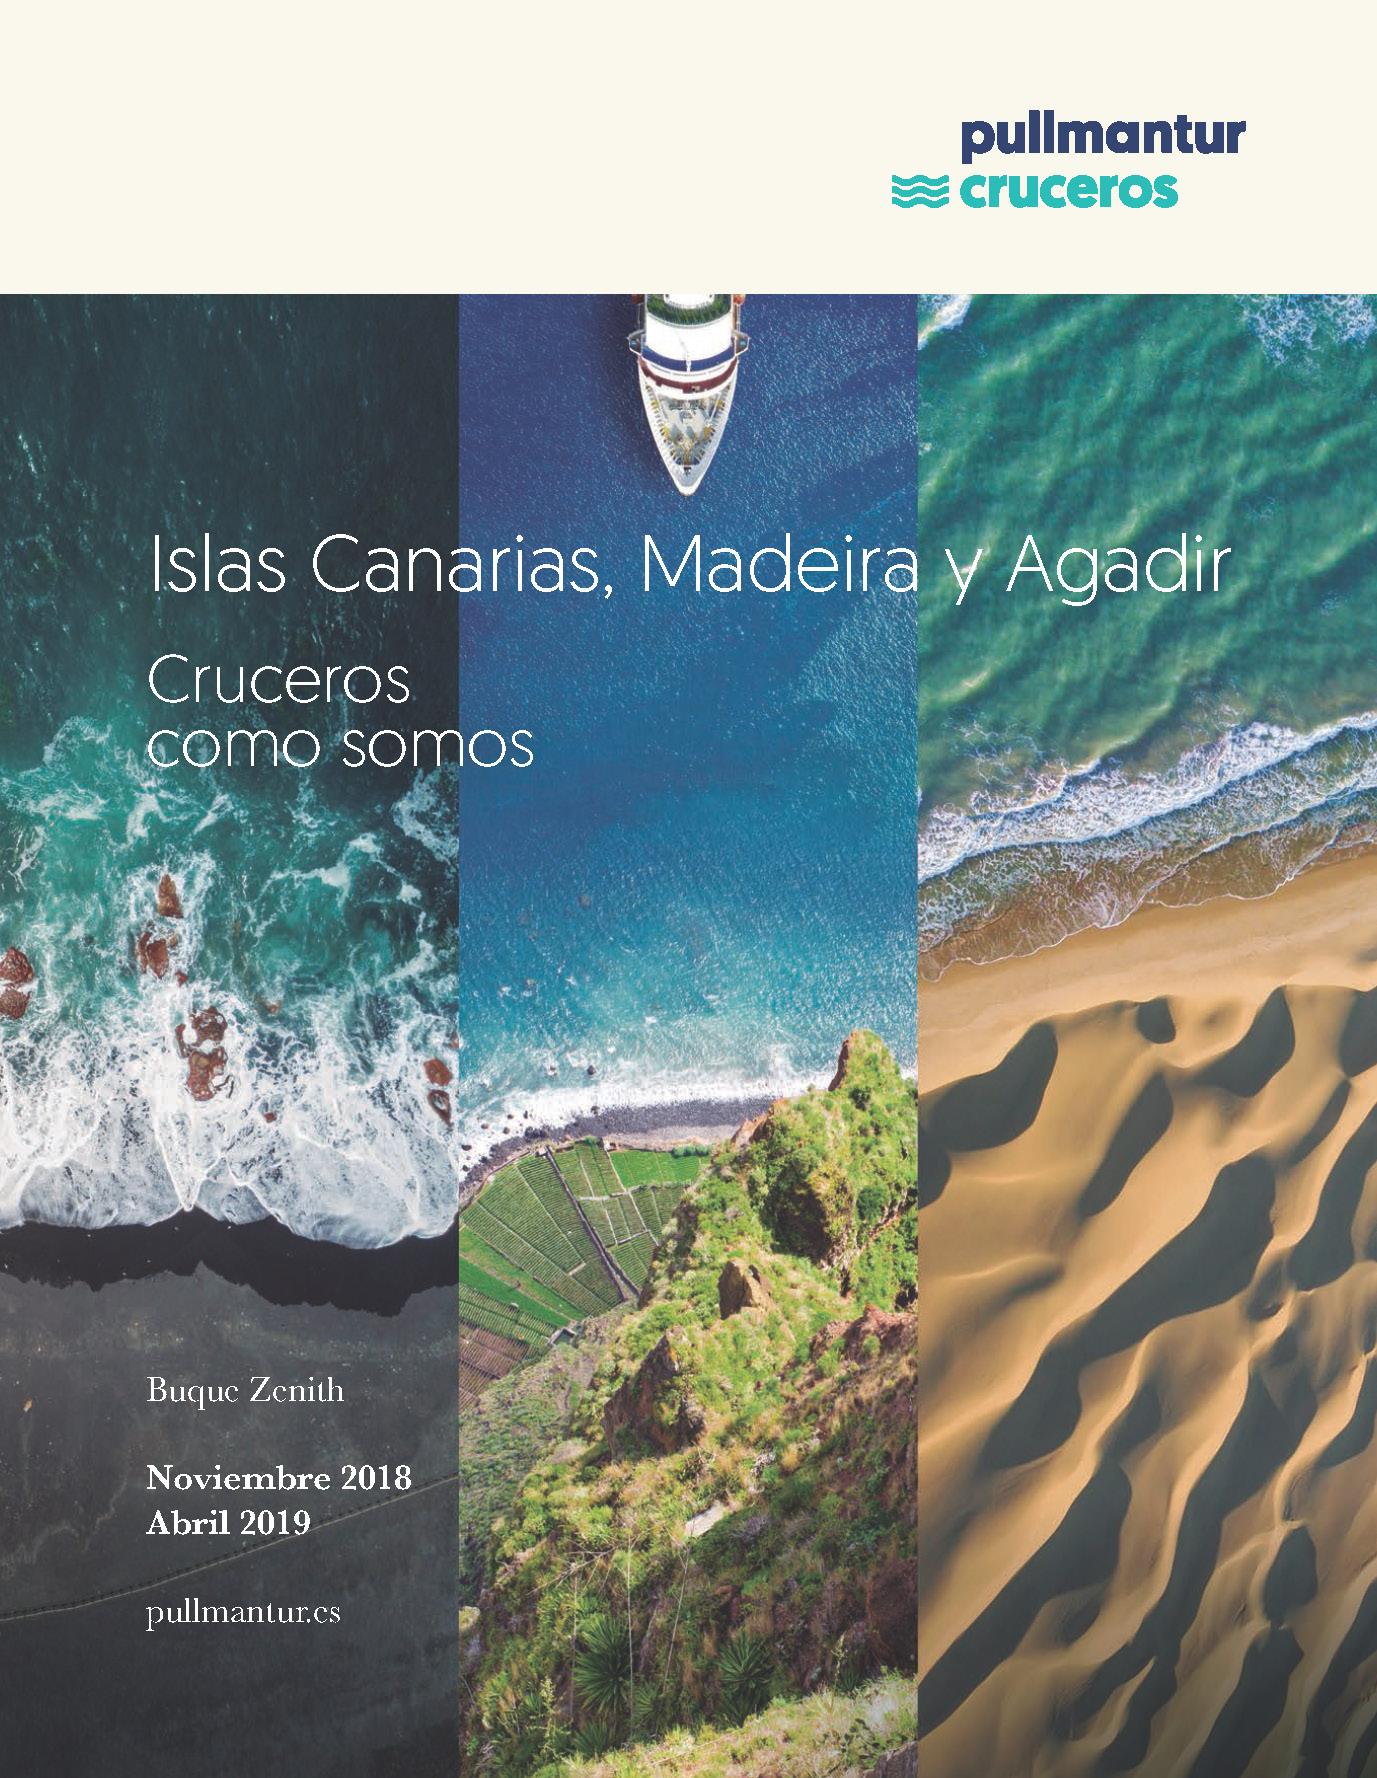 Catalogo Pullmantur Cruceros Canarias Madeira y Agadir 2018-2019